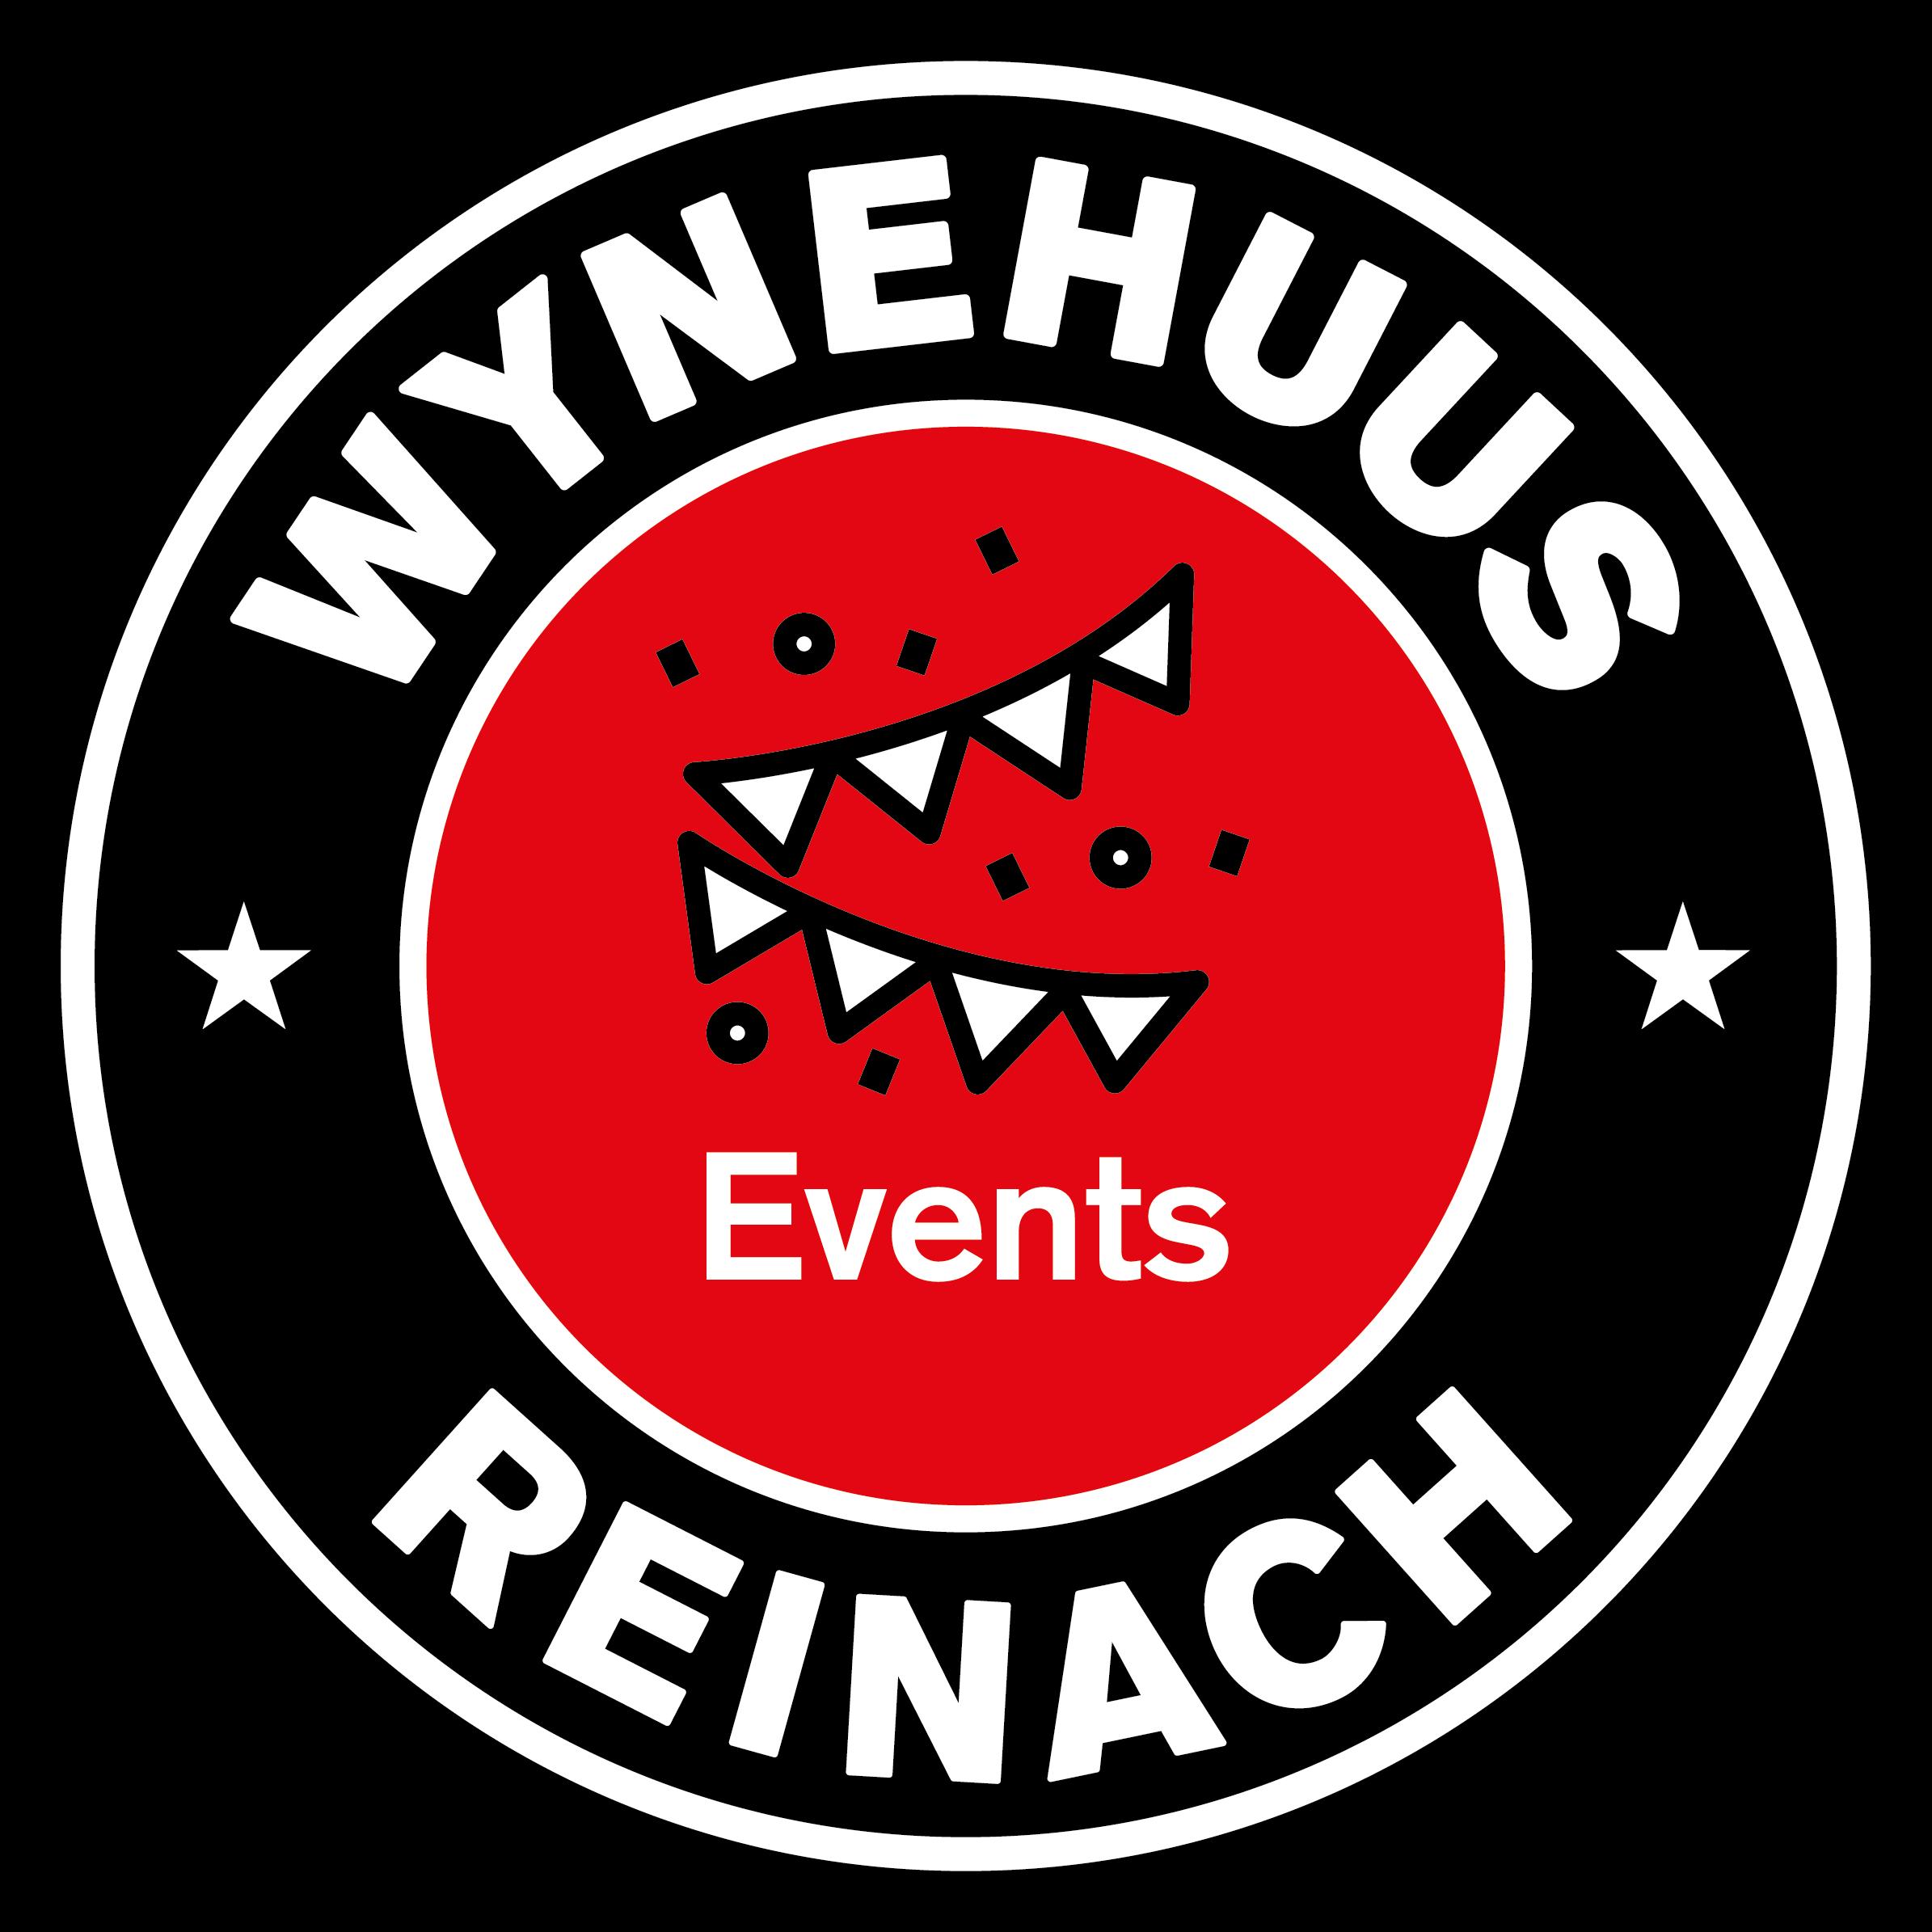 Wynehuus_Events